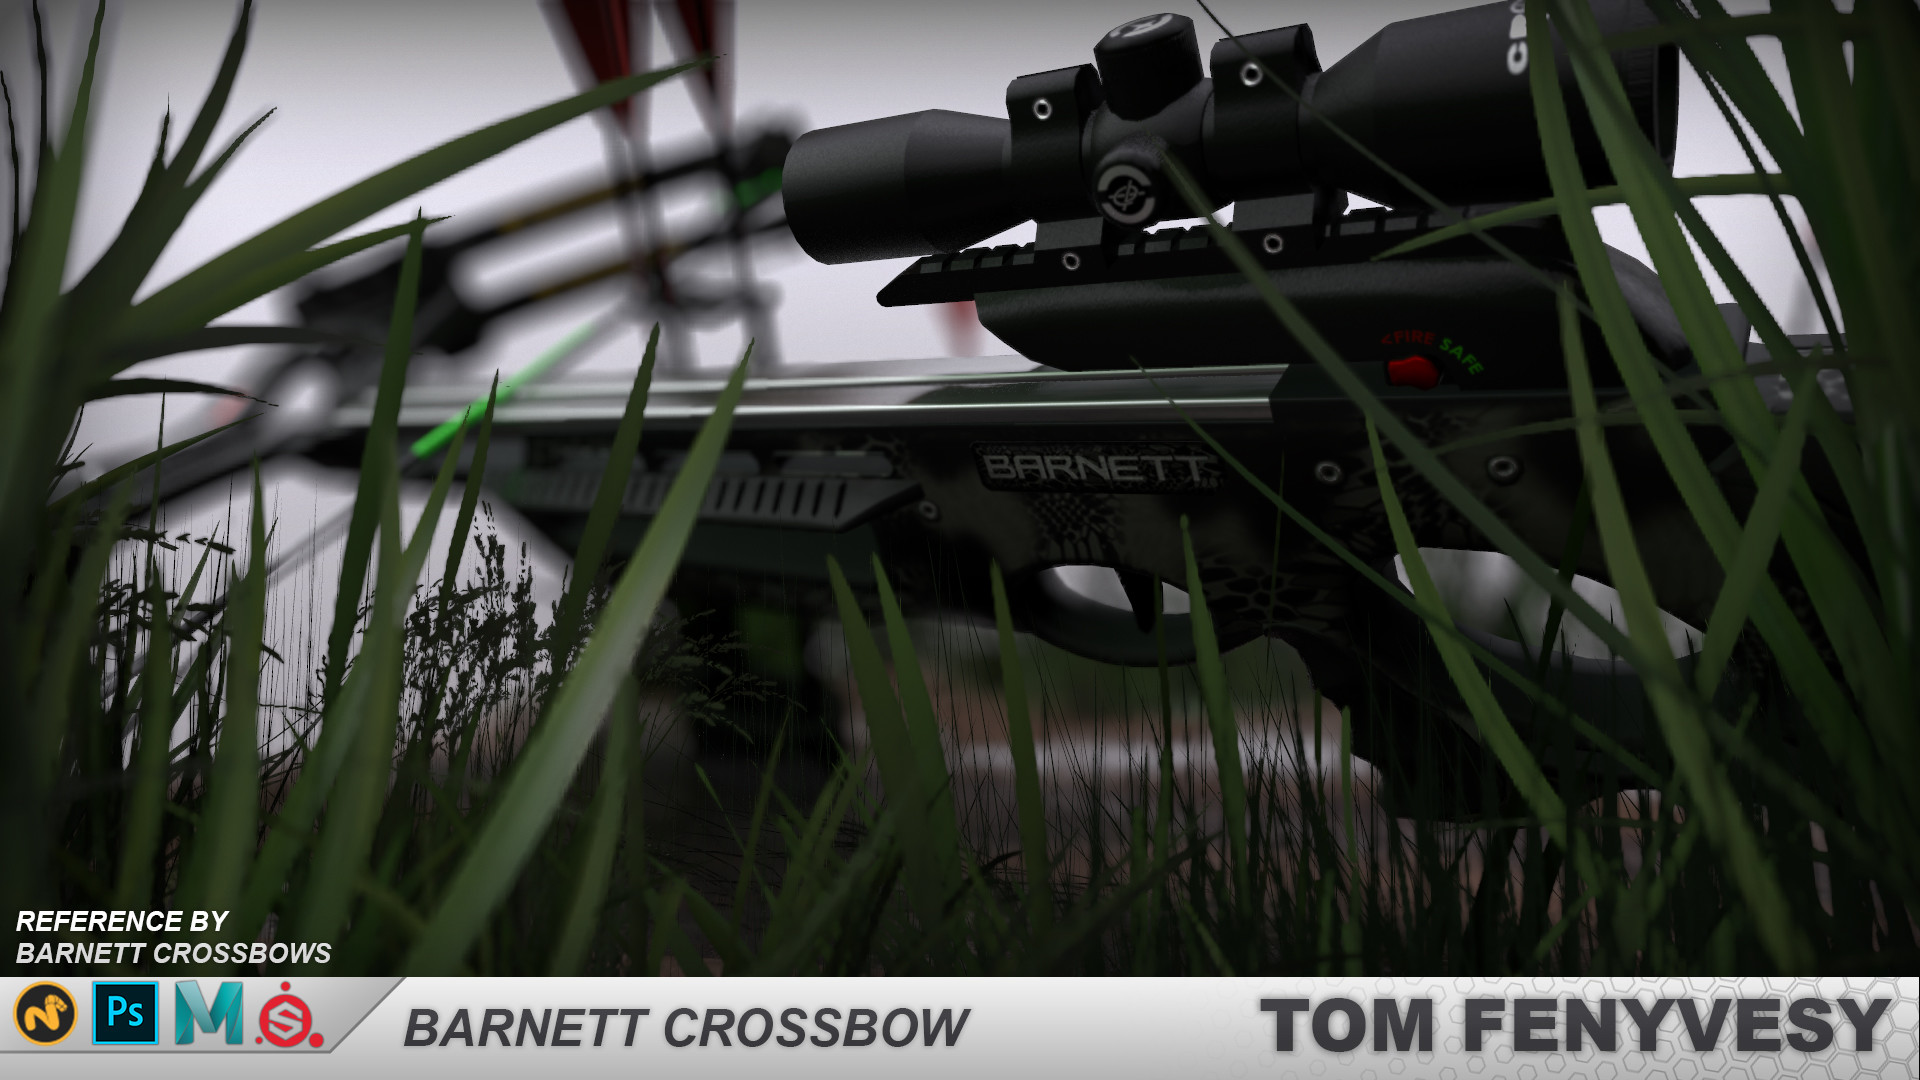 ArtStation - Barnett Crossbow, Tom Fenyvesy